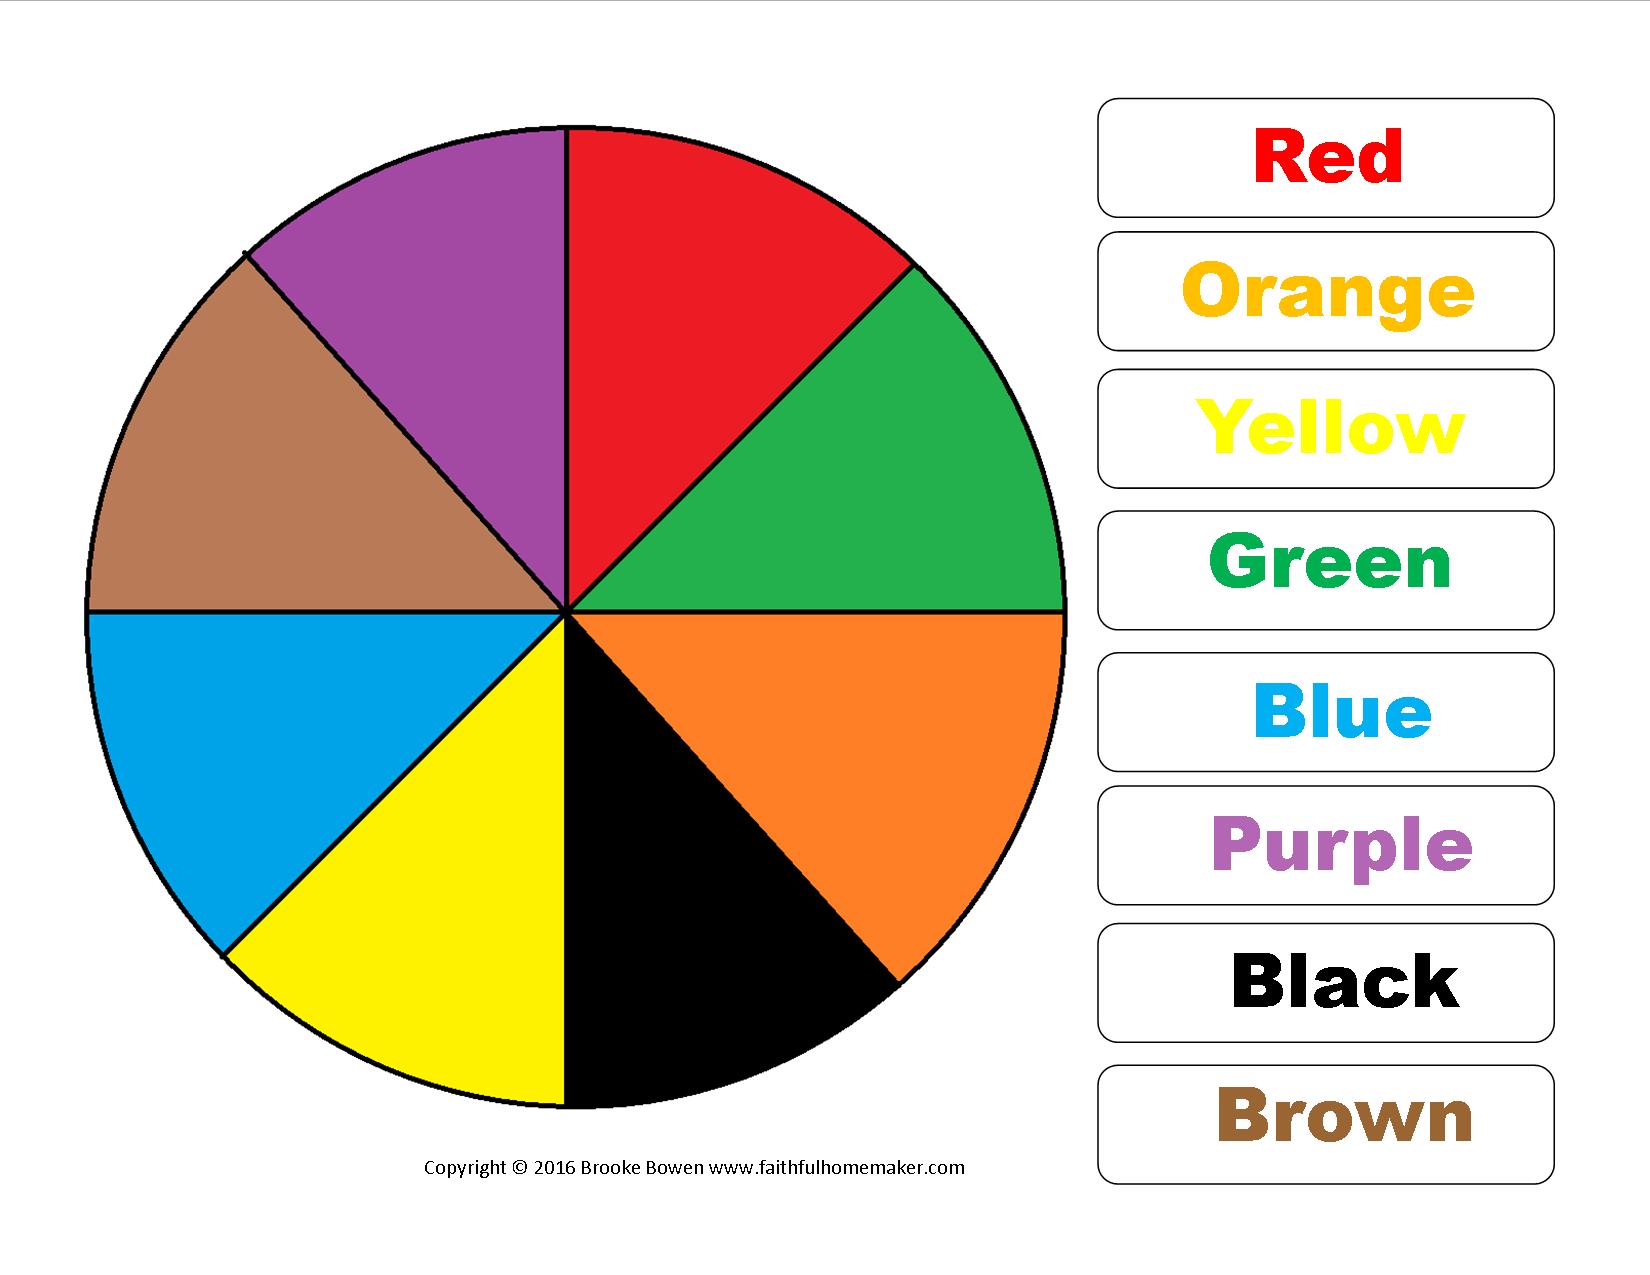 Free Printable Color Wheel The Faithful Homemaker